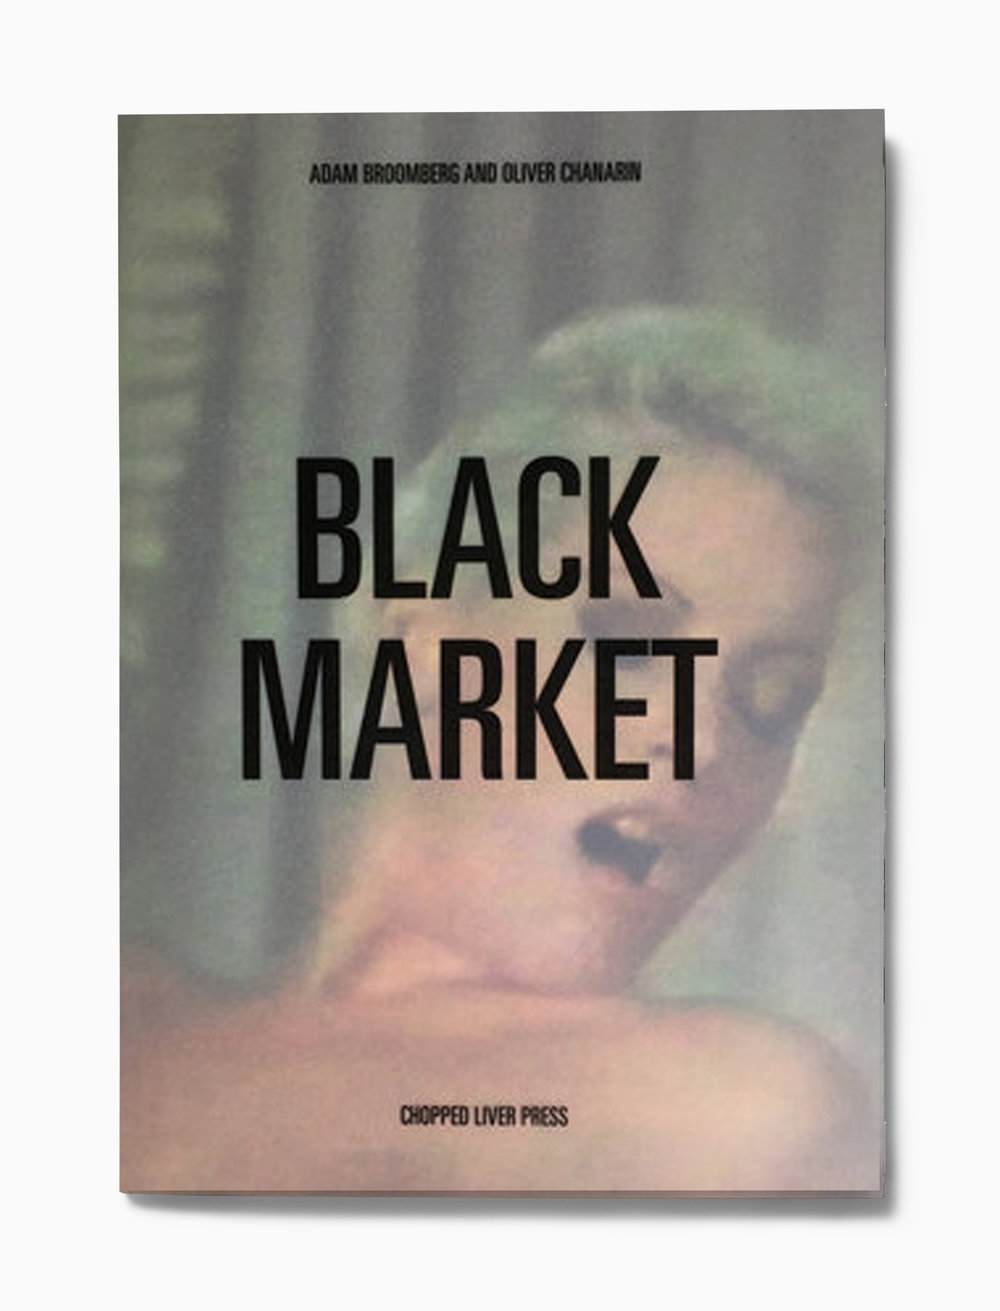 Black Market  Chopped Liver Press, 2012